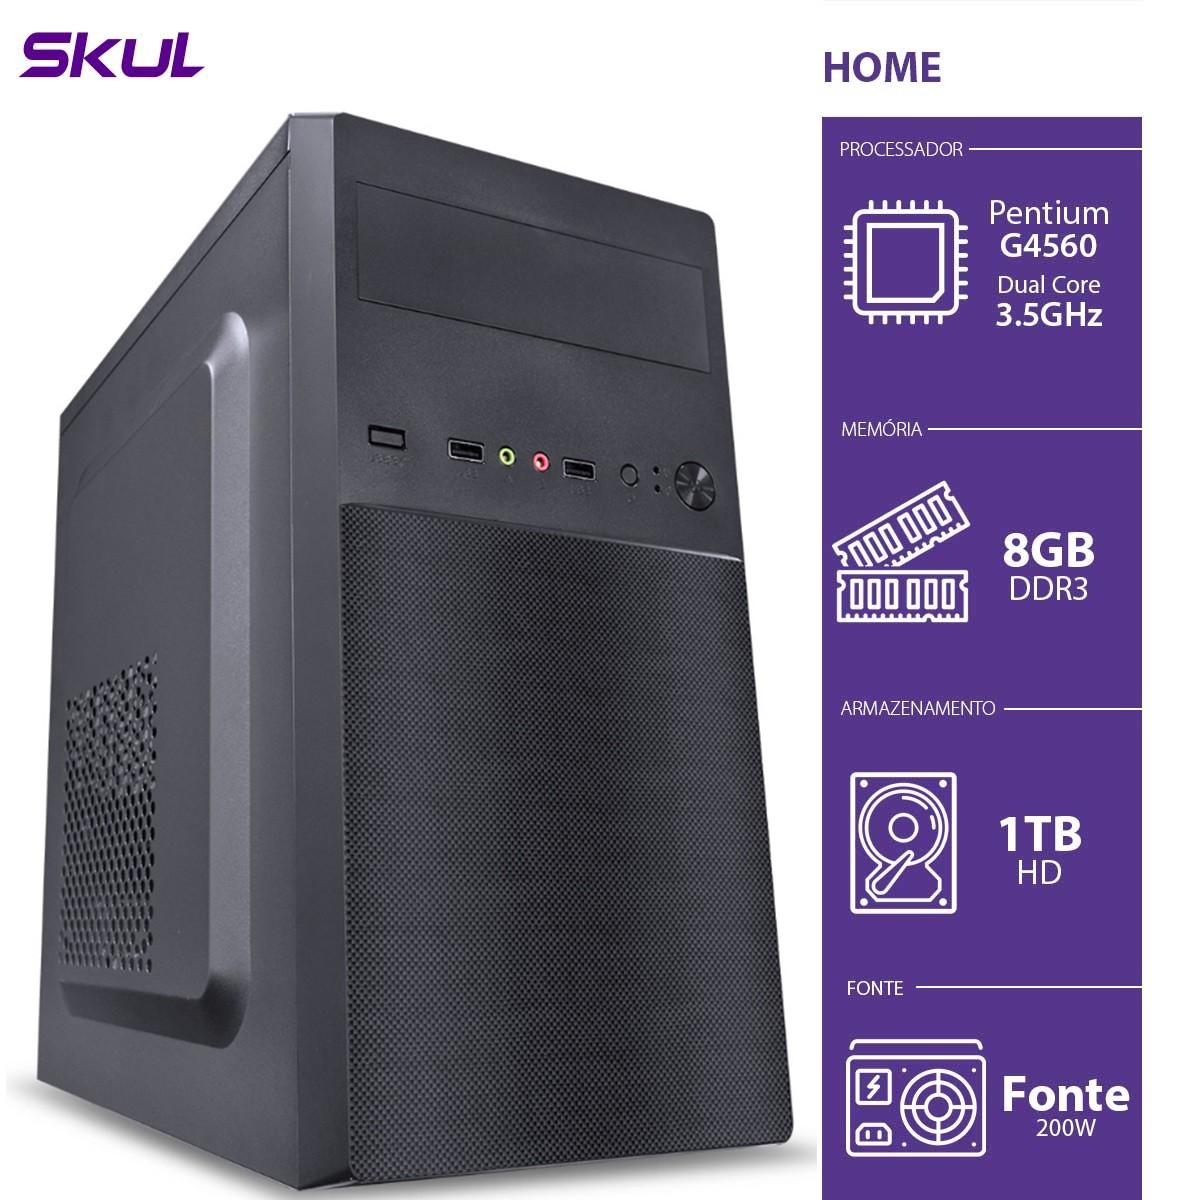 Computador Home H200 - Pentium Dual Core G4560 3.5GHZ 8GB DDR3 HD 1TB HDMI/VGA Fonte 200W - HG45601T8D3 - SKUL